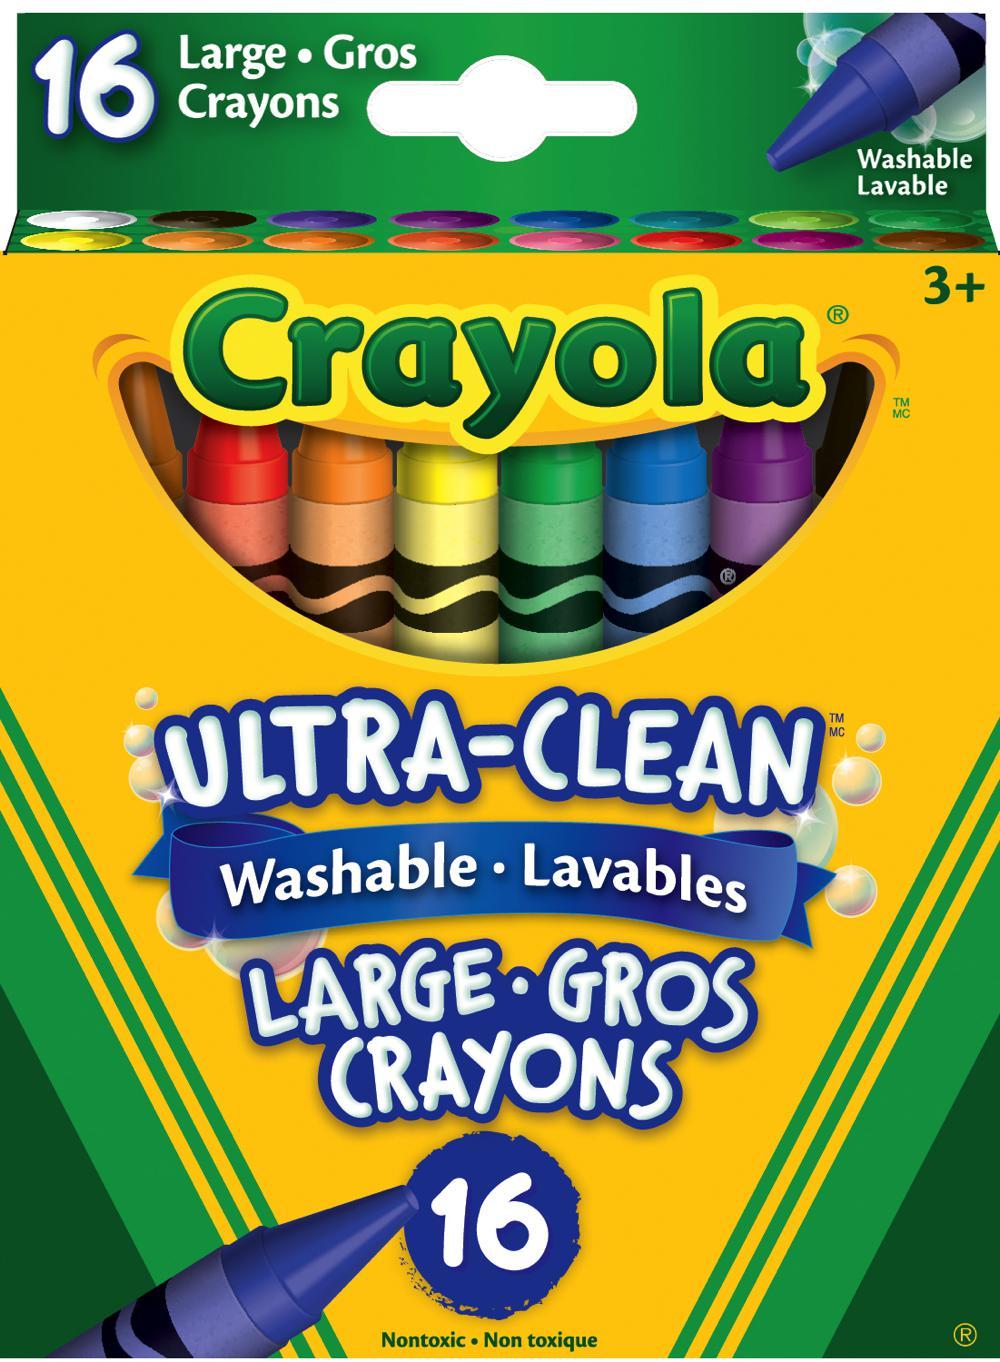 Crayola - 16 washable crayons